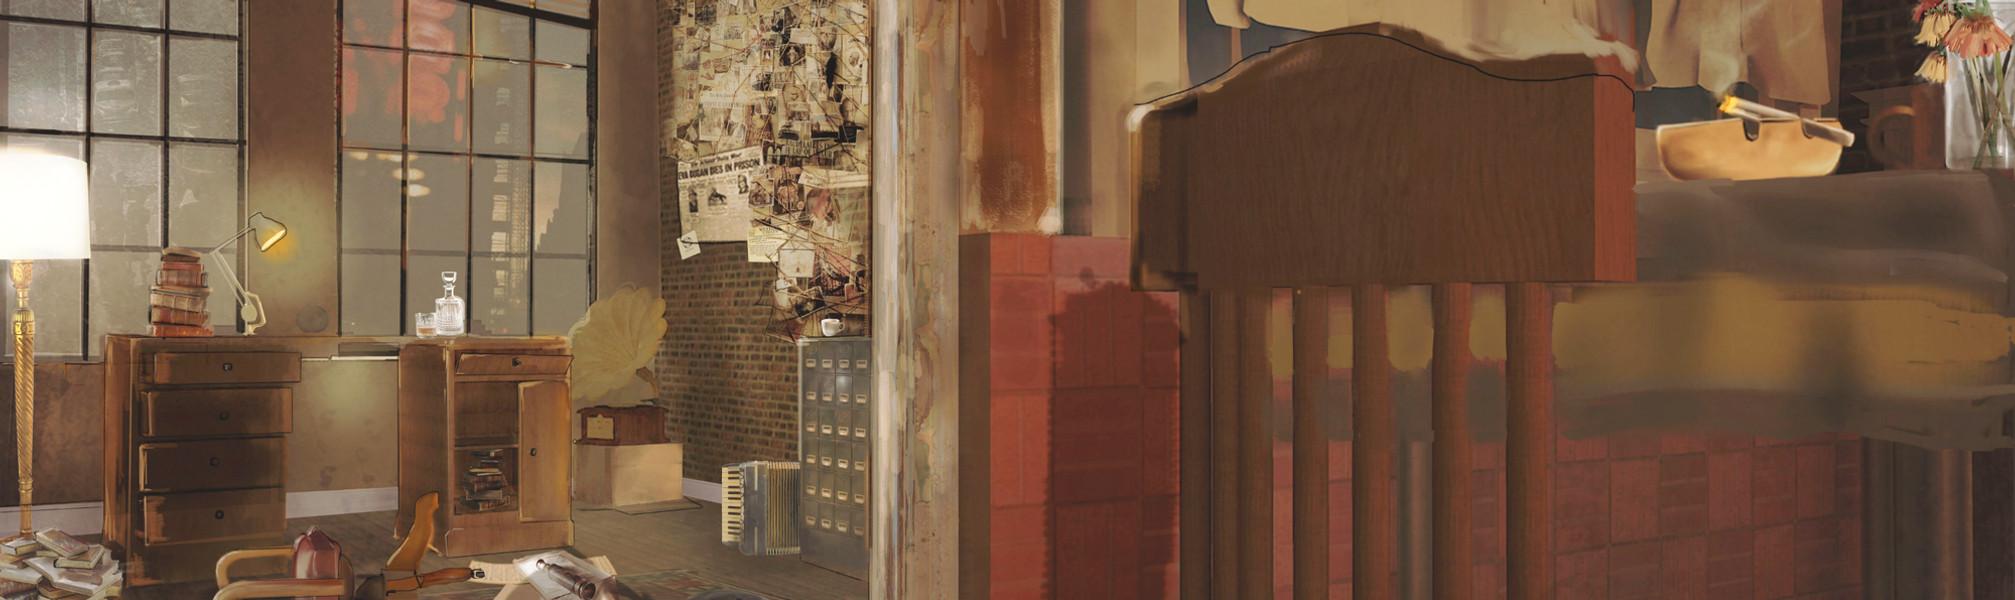 visual 1 - lemony's hideout 1950s darker